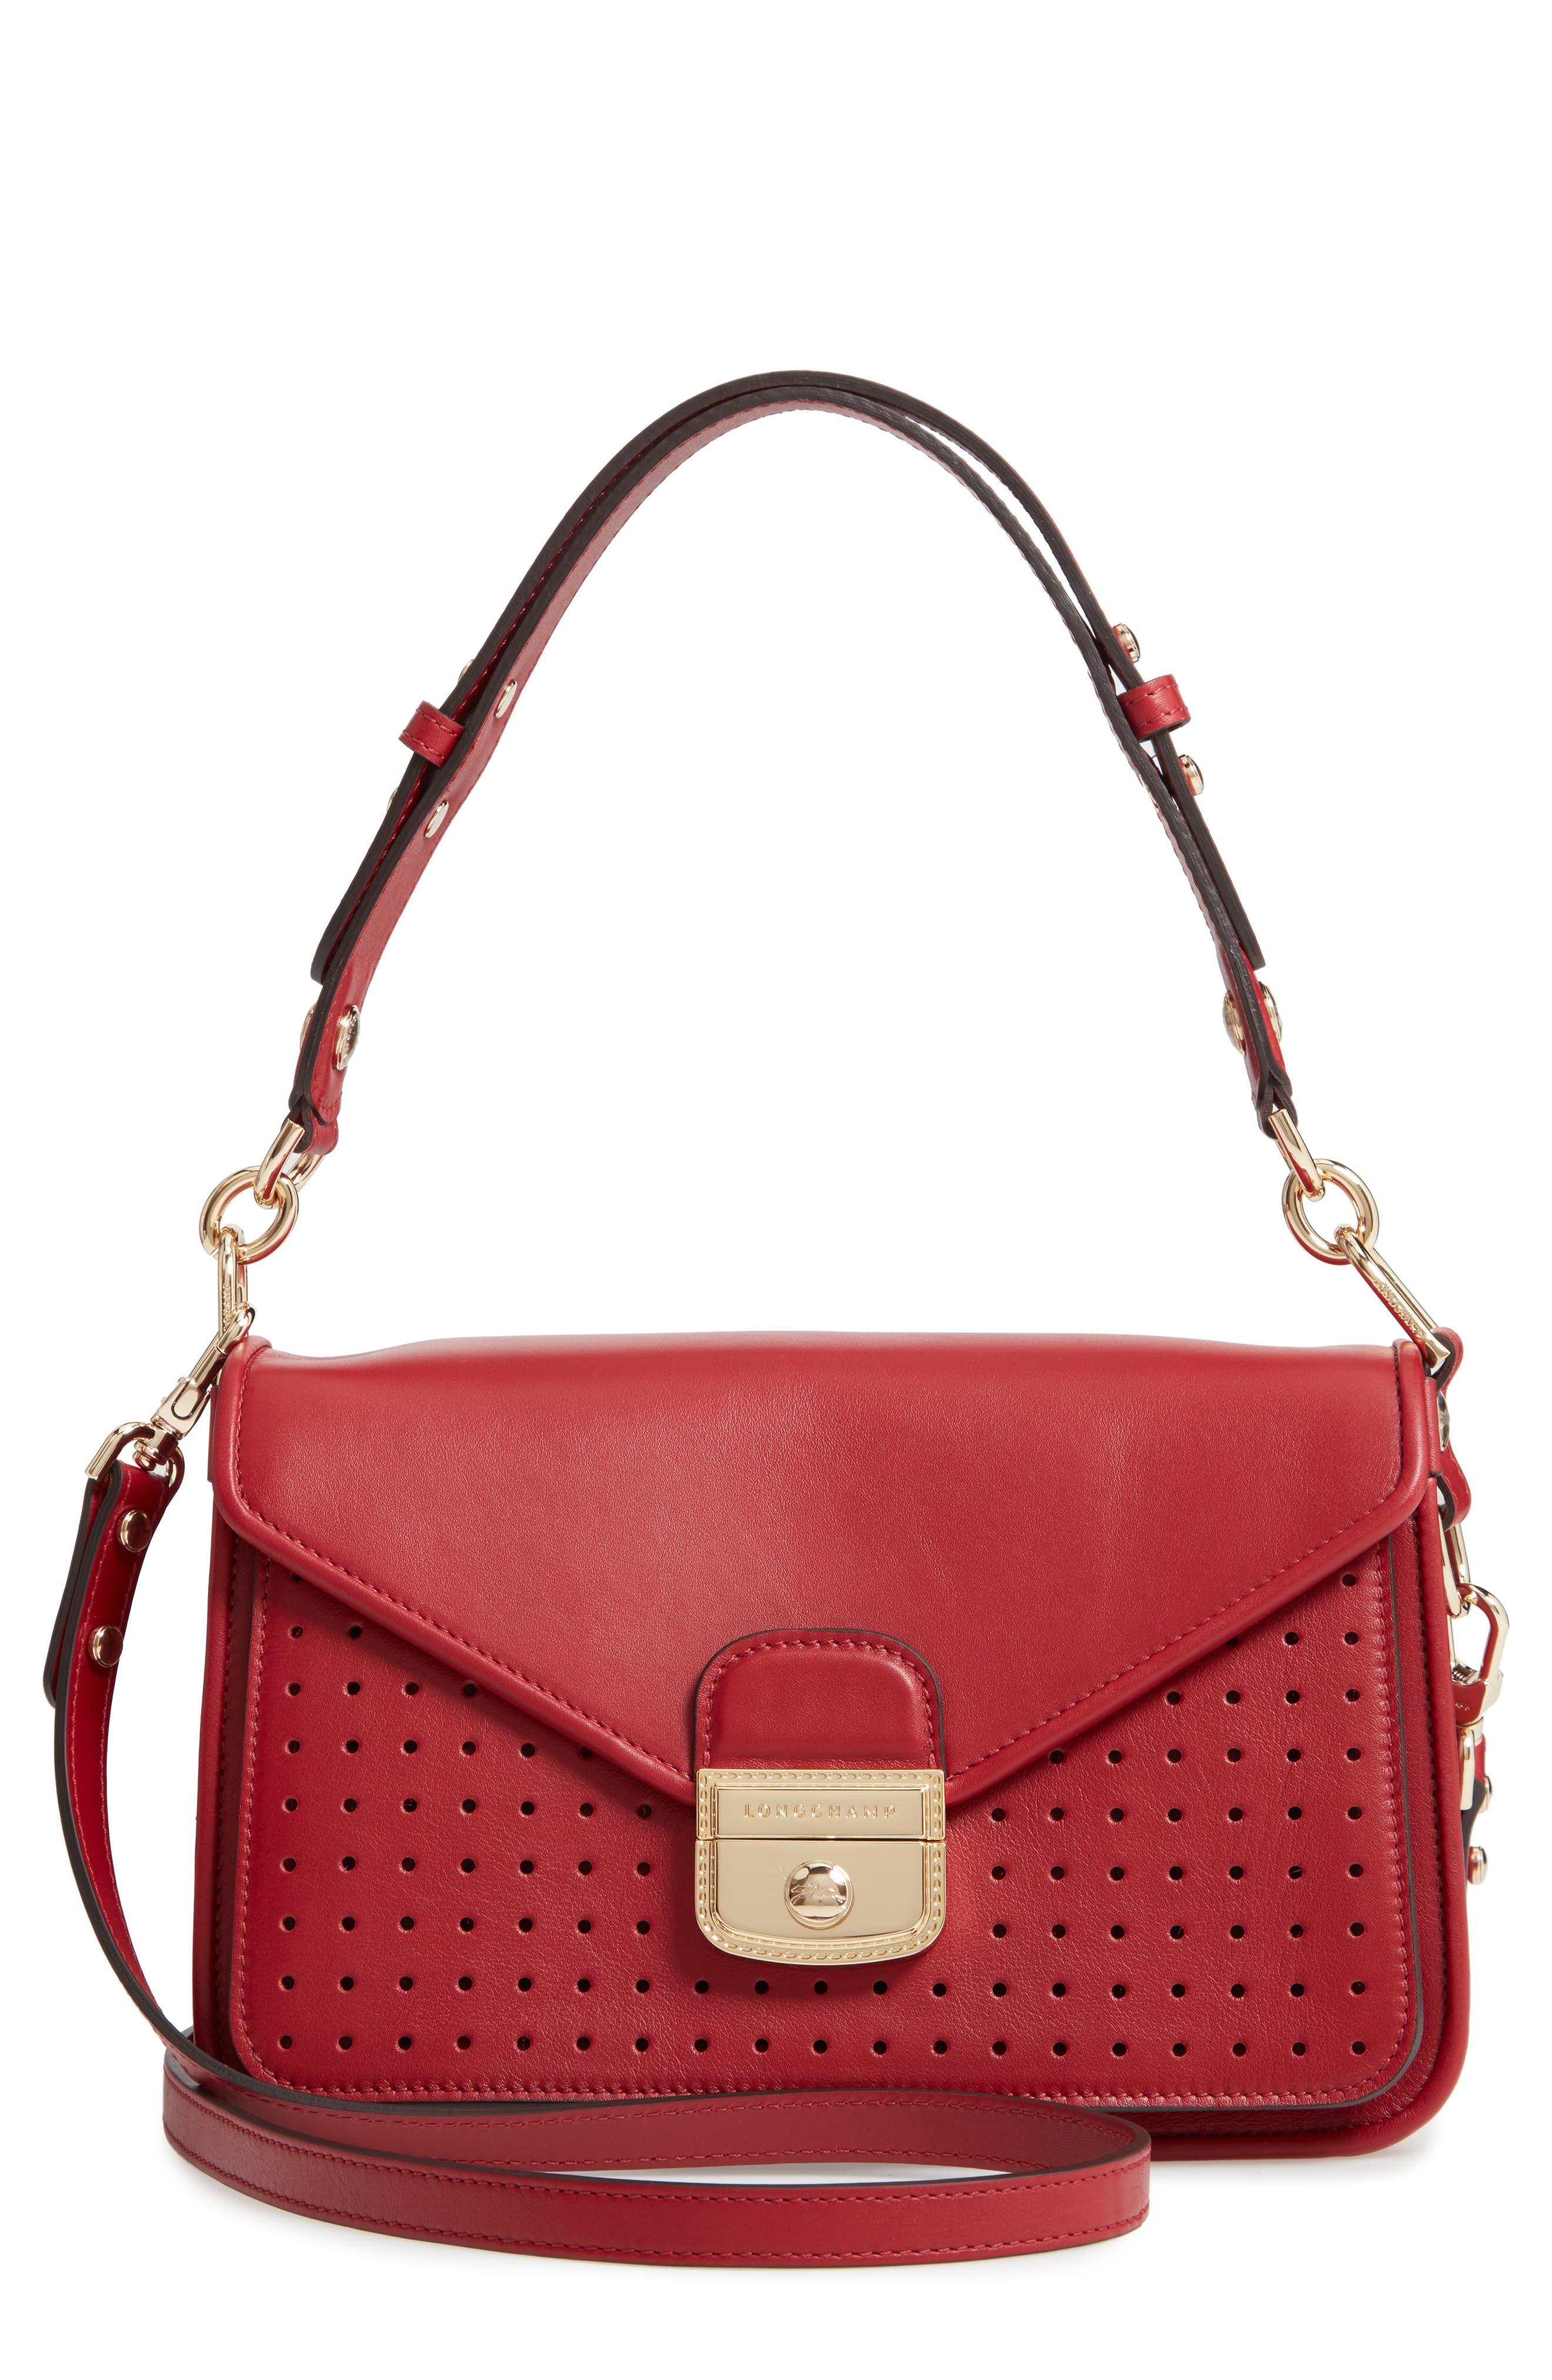 Mademoiselle Calfskin Leather Crossbody Bag,                         Main,                         color, GARNET RED